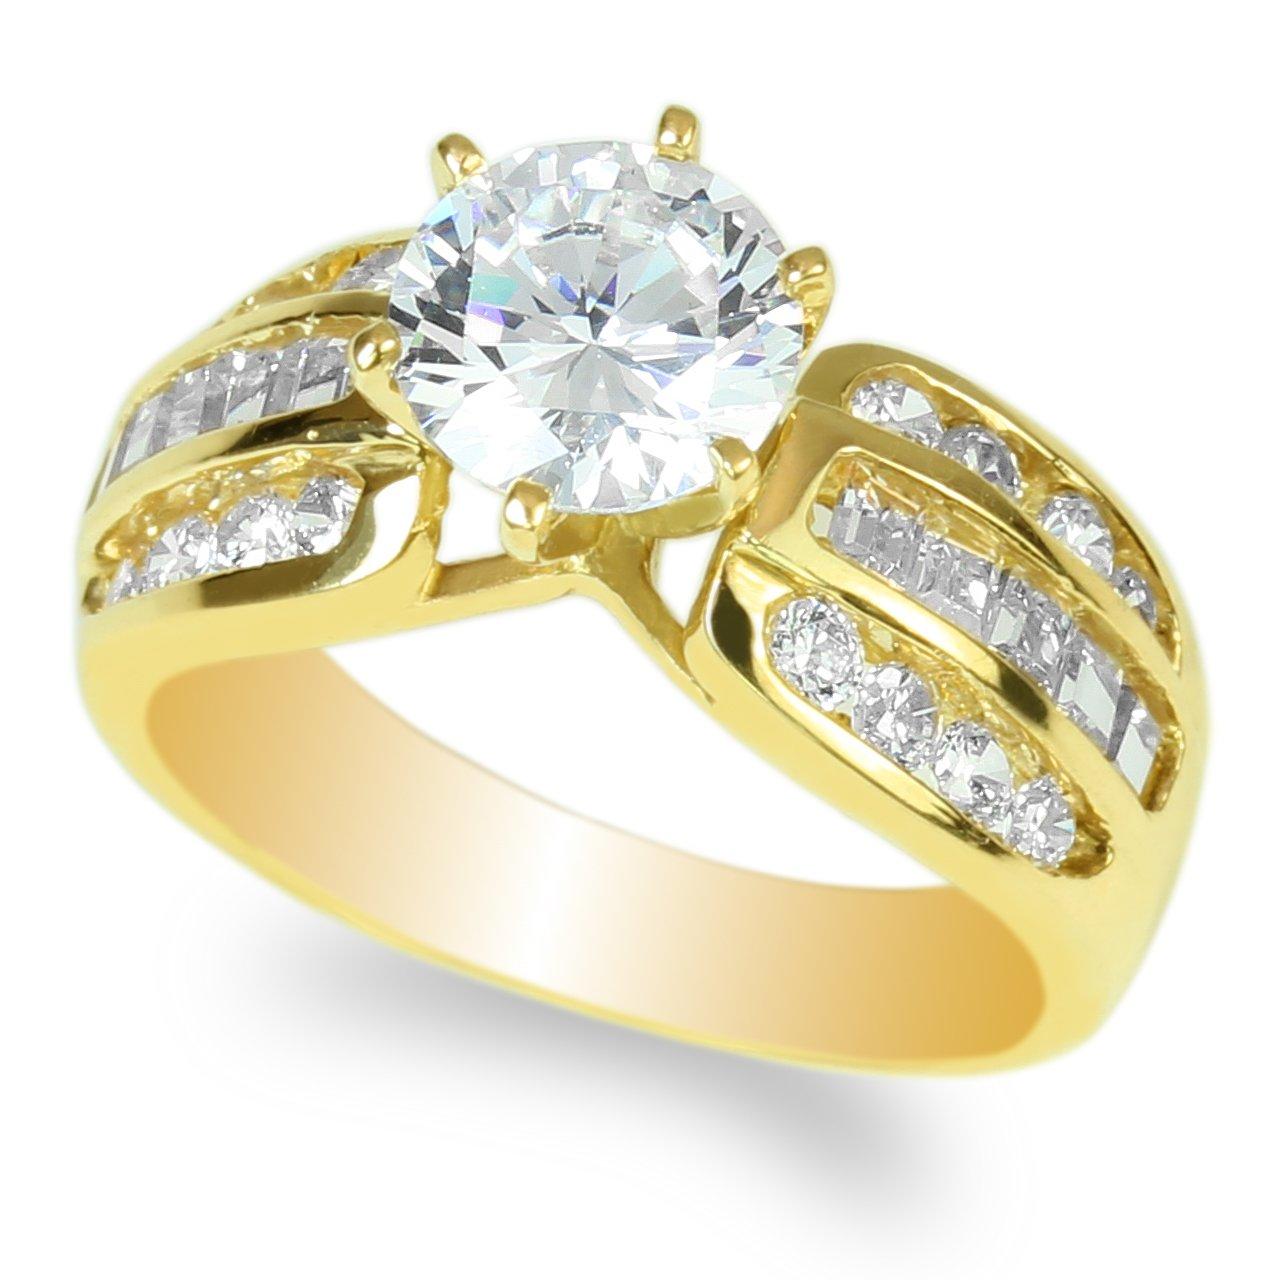 JamesJenny Ladies 10K Yellow Gold 1.5ct Round CZ Wedding Solitaire Ring Size 8